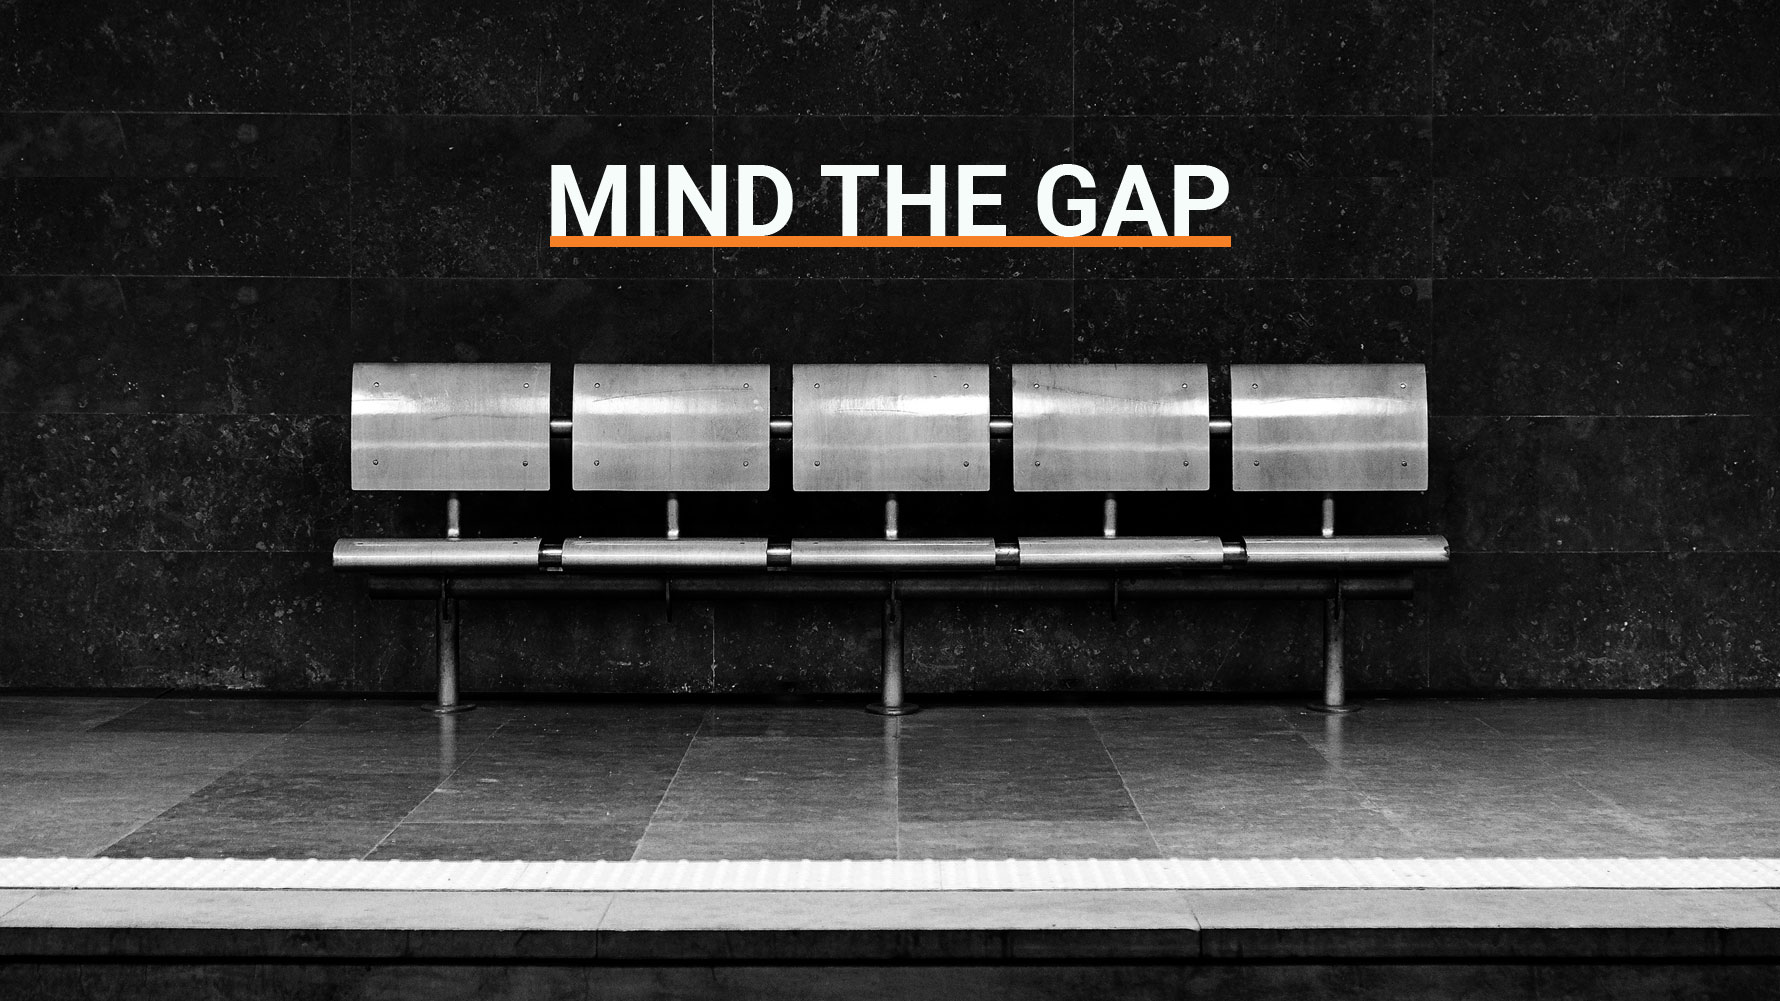 MindThe Gap